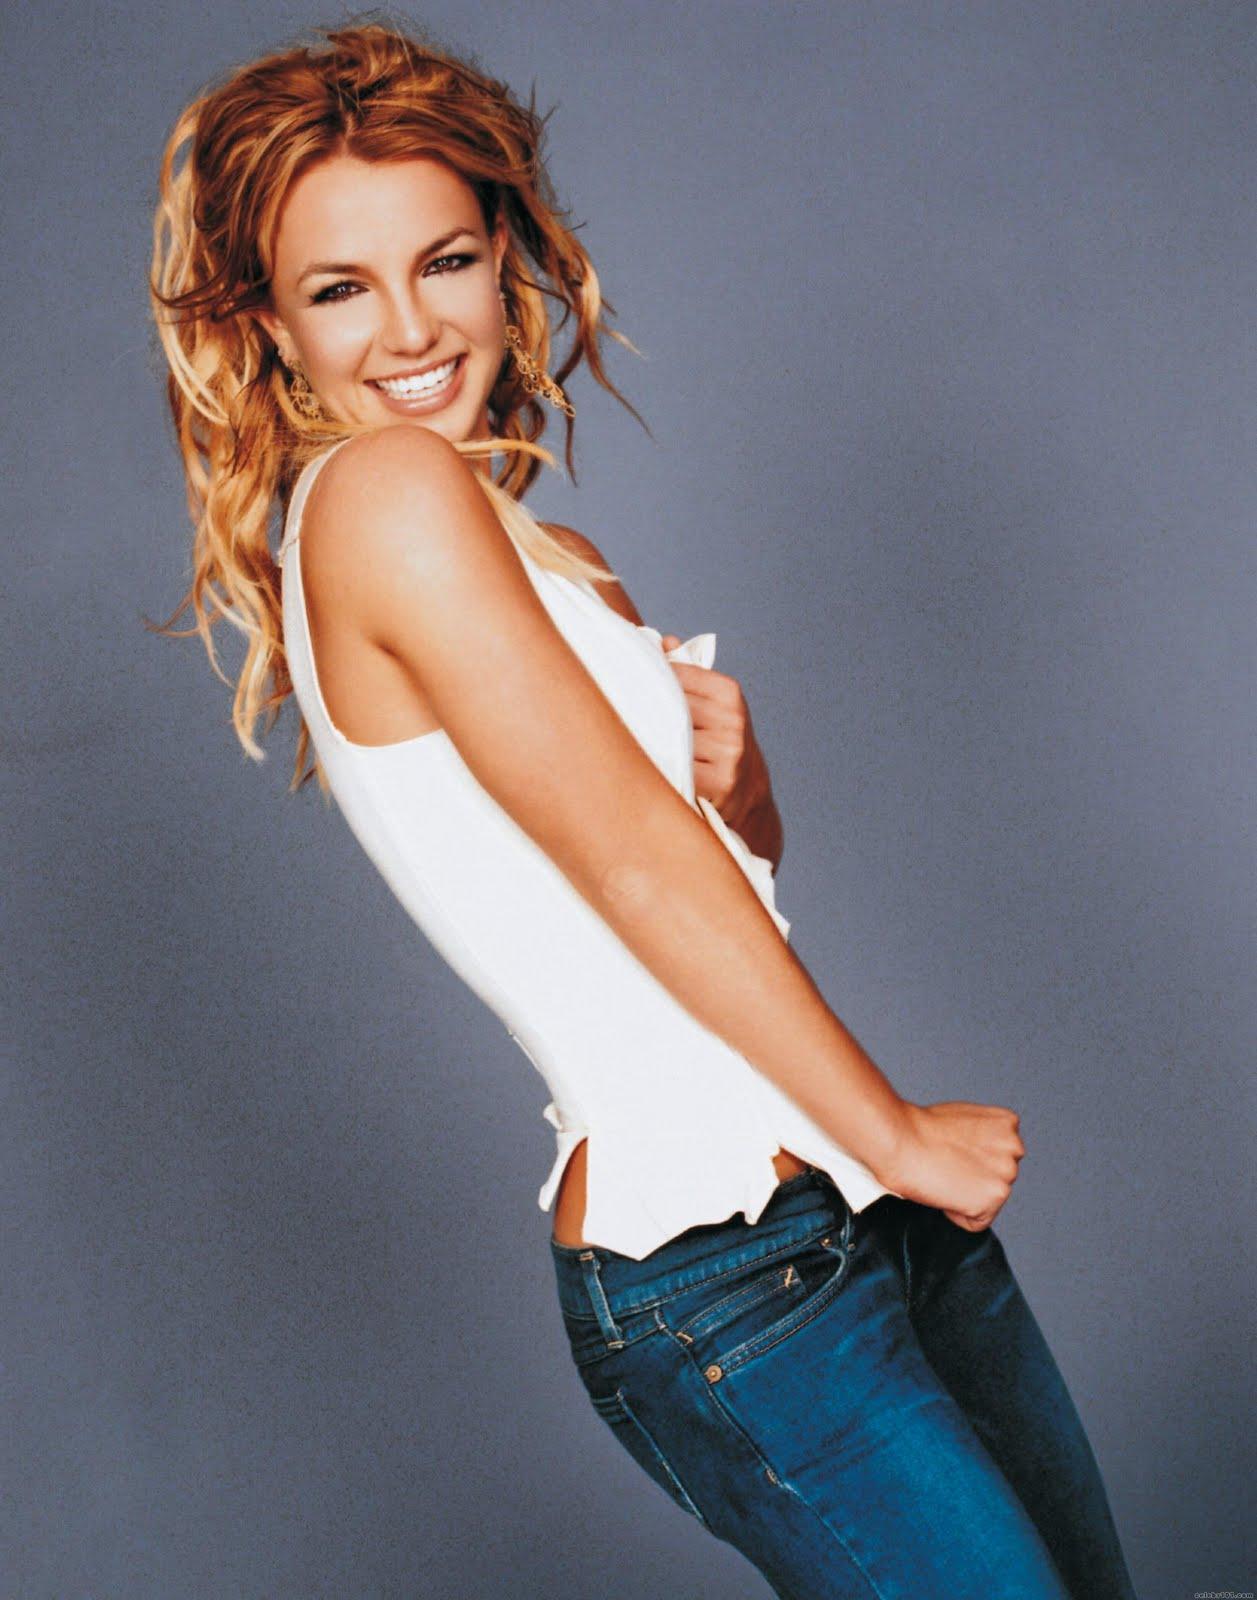 http://3.bp.blogspot.com/-bGNxvYWn0a0/TsPKothjngI/AAAAAAAAA1c/IFU04I7LU2g/s1600/Britney-Spears-body.jpg